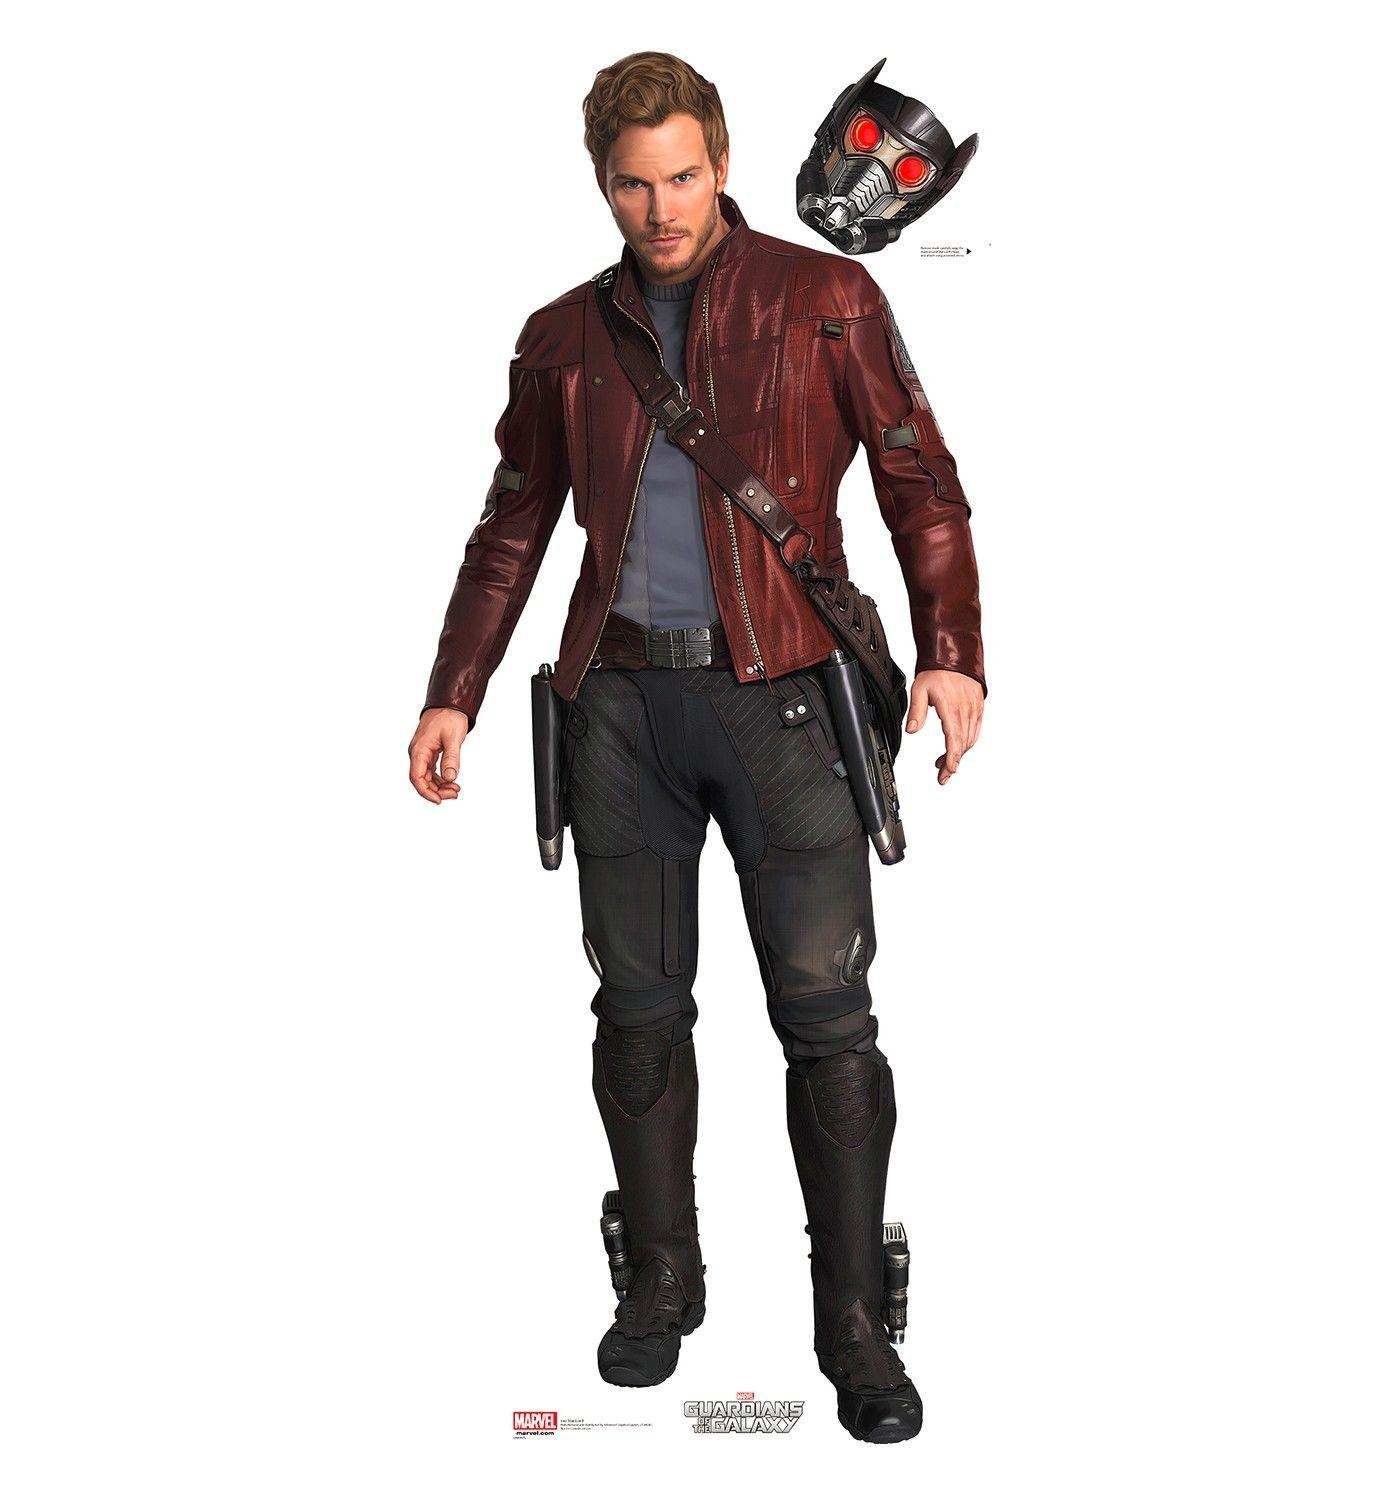 Image - Star-Lord Promo Art Decor I.jpg | Marvel Movies ...